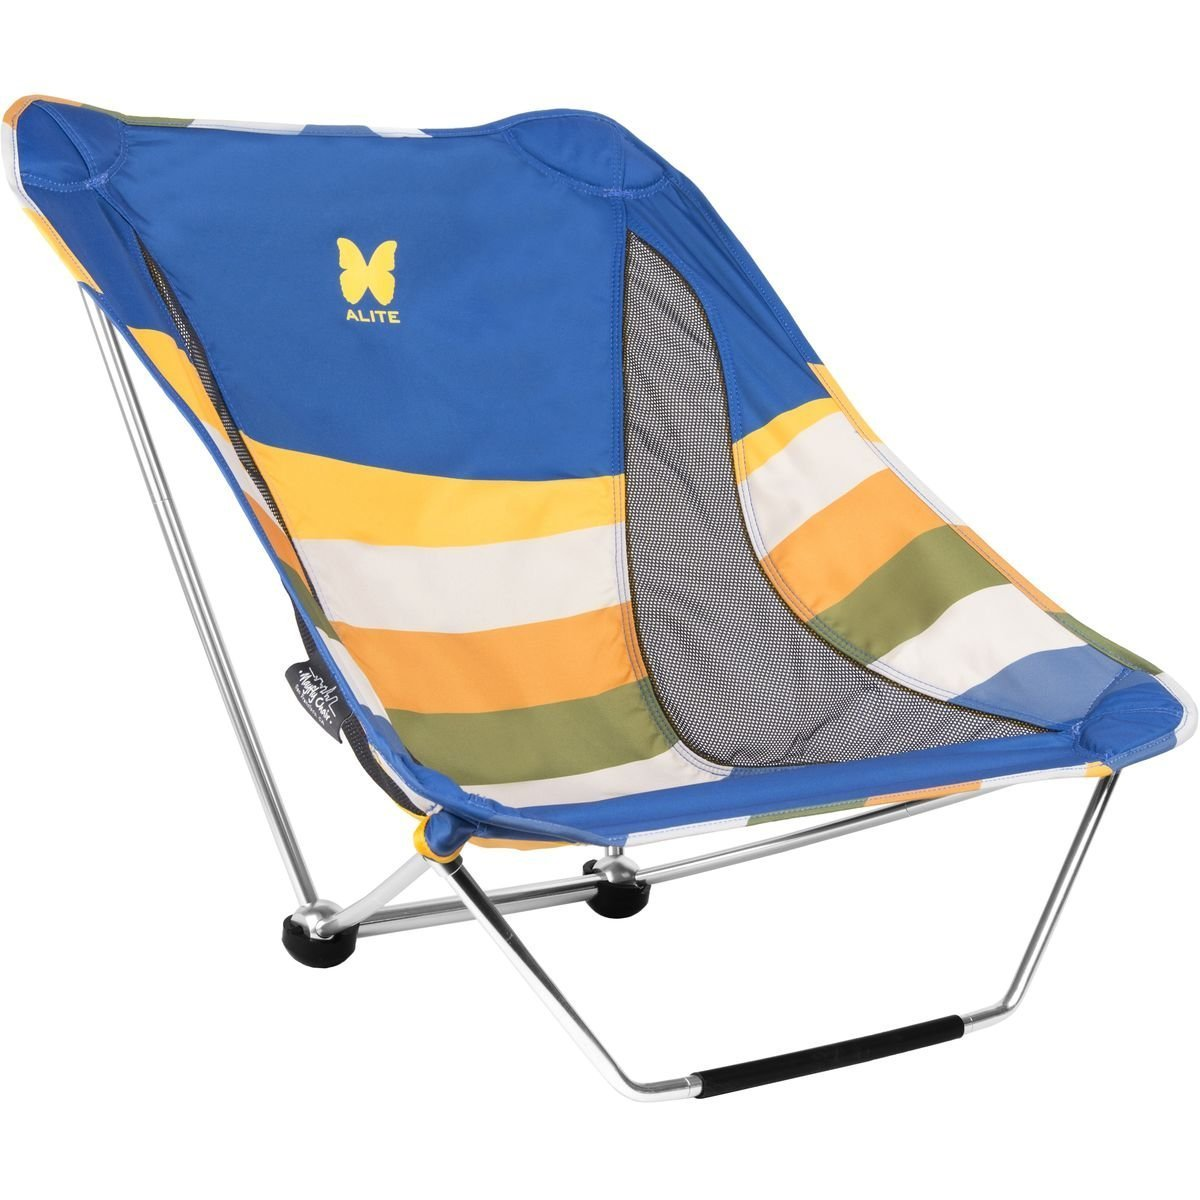 alite(エーライト) Mayfly Chair メイフライチェア (並行輸入品) B078YMR2FR リプタイド リプタイド